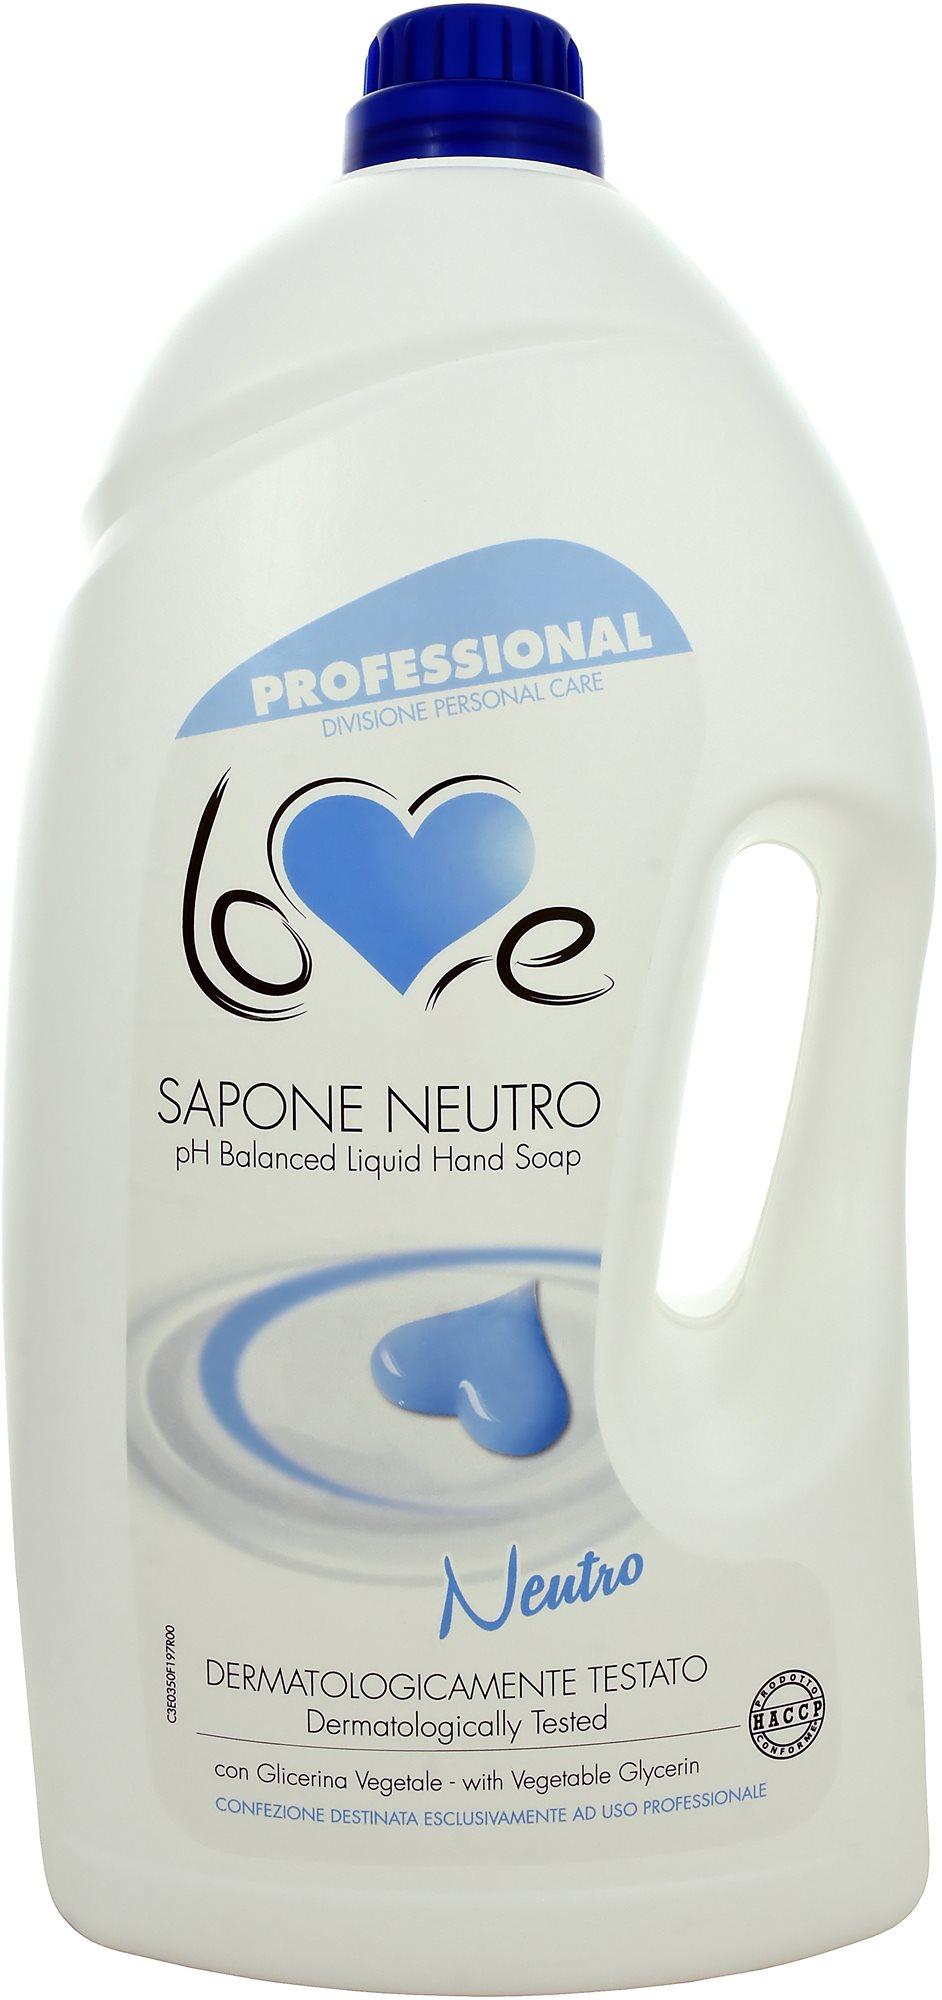 Love Sapone Neutro Latte 5 l